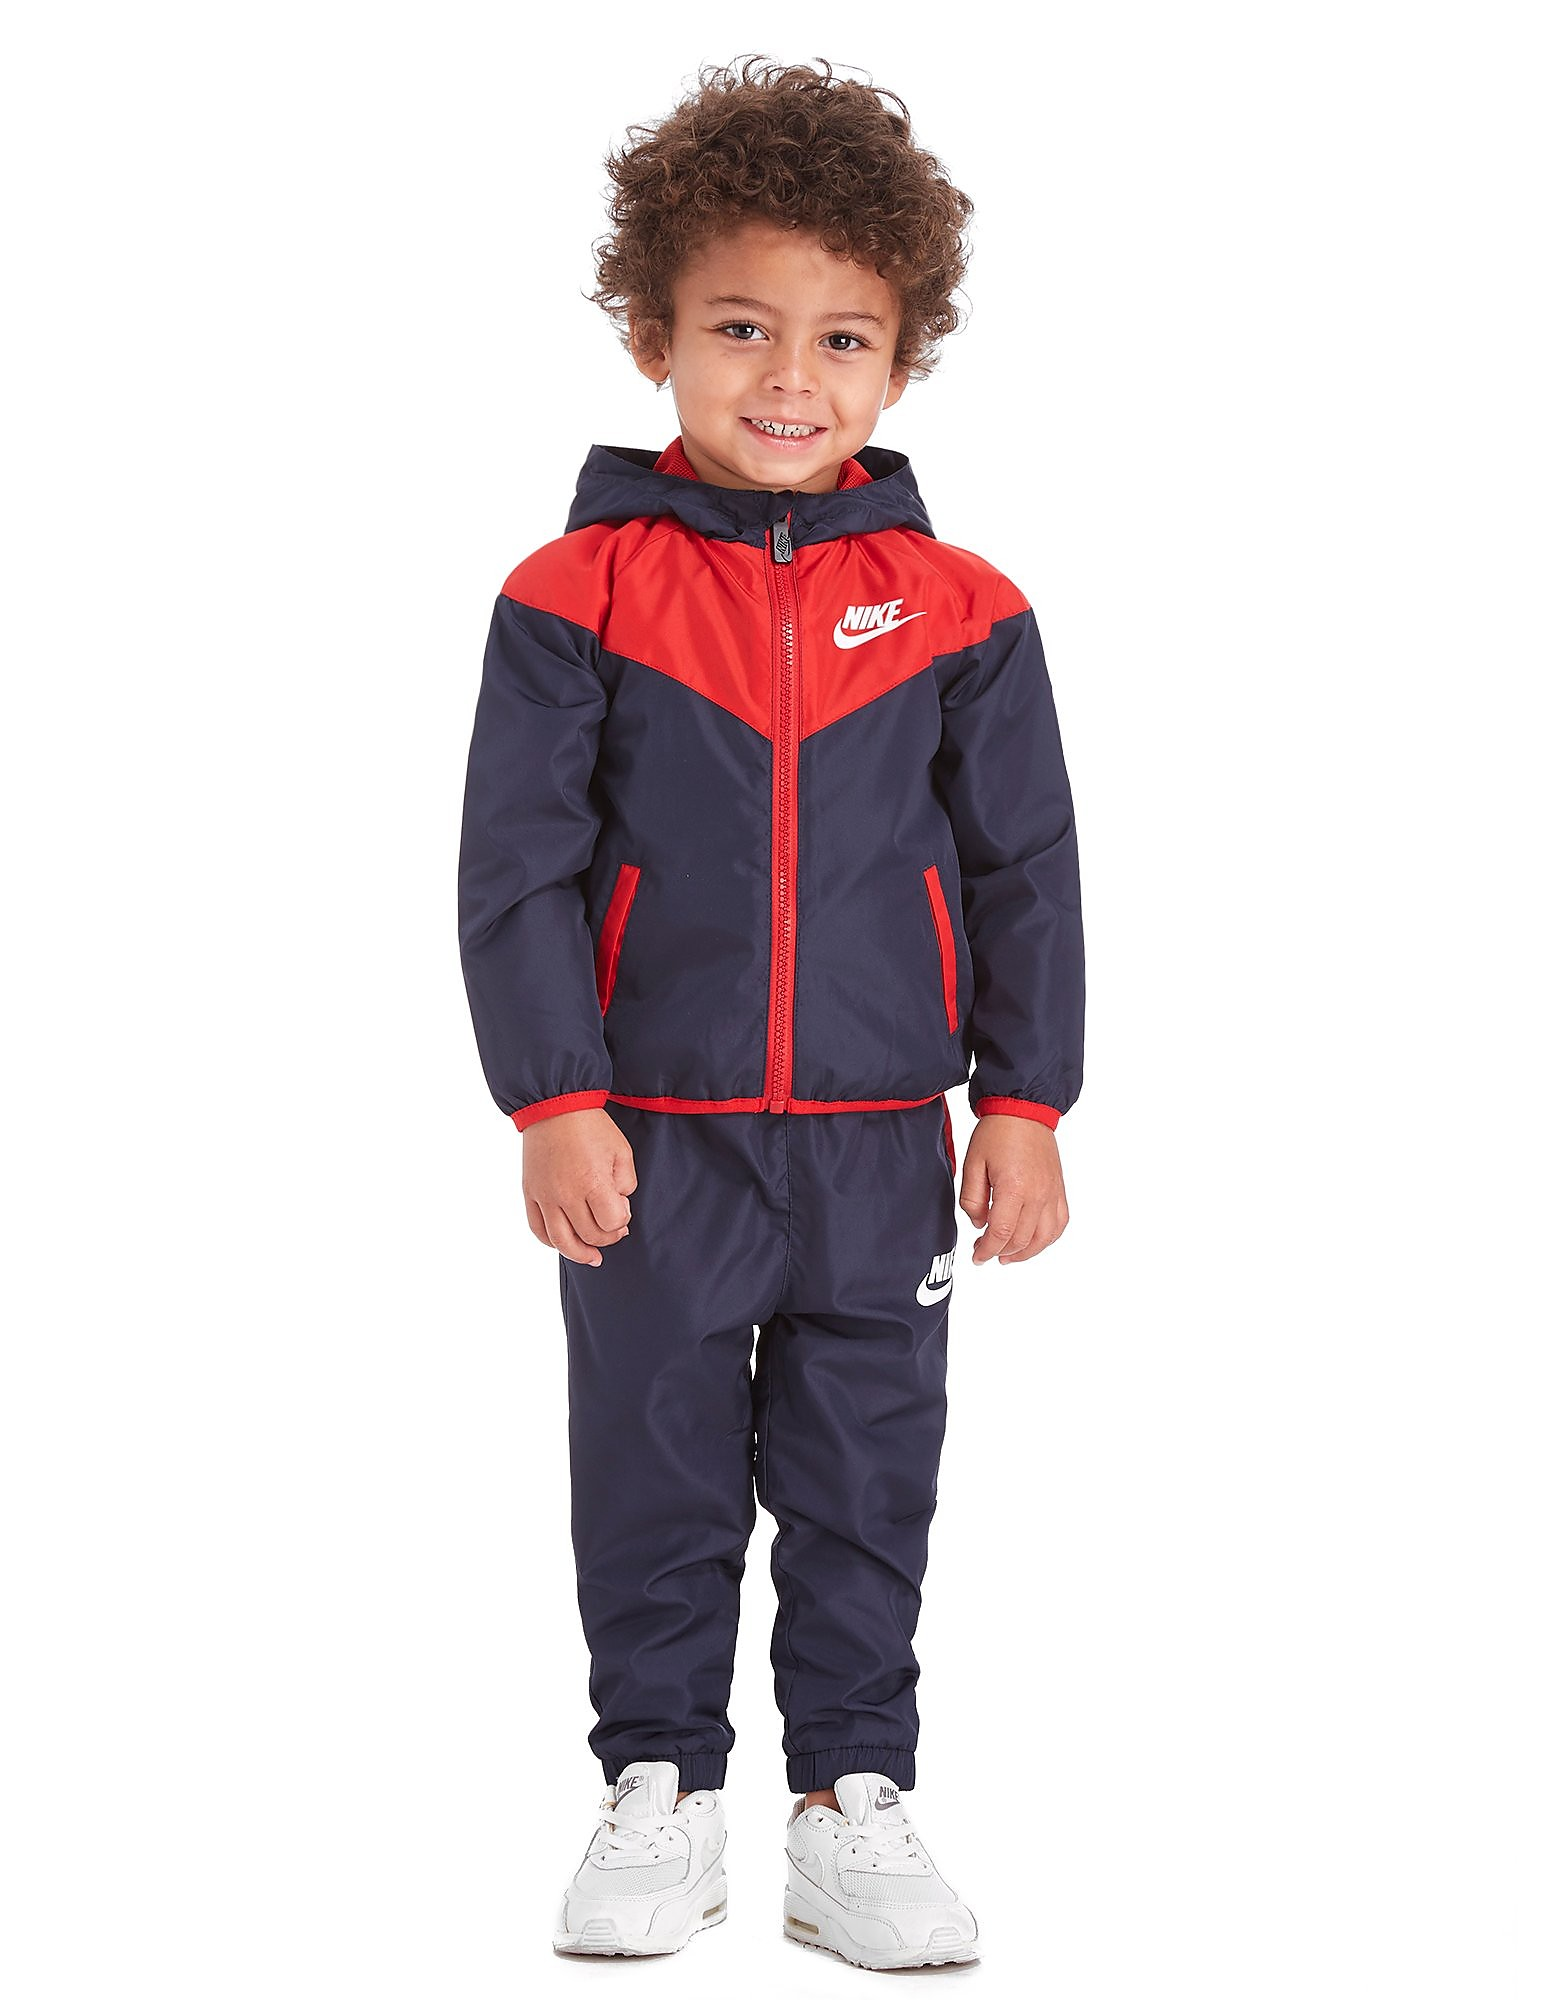 Nike Futura Tracksuit Baby's